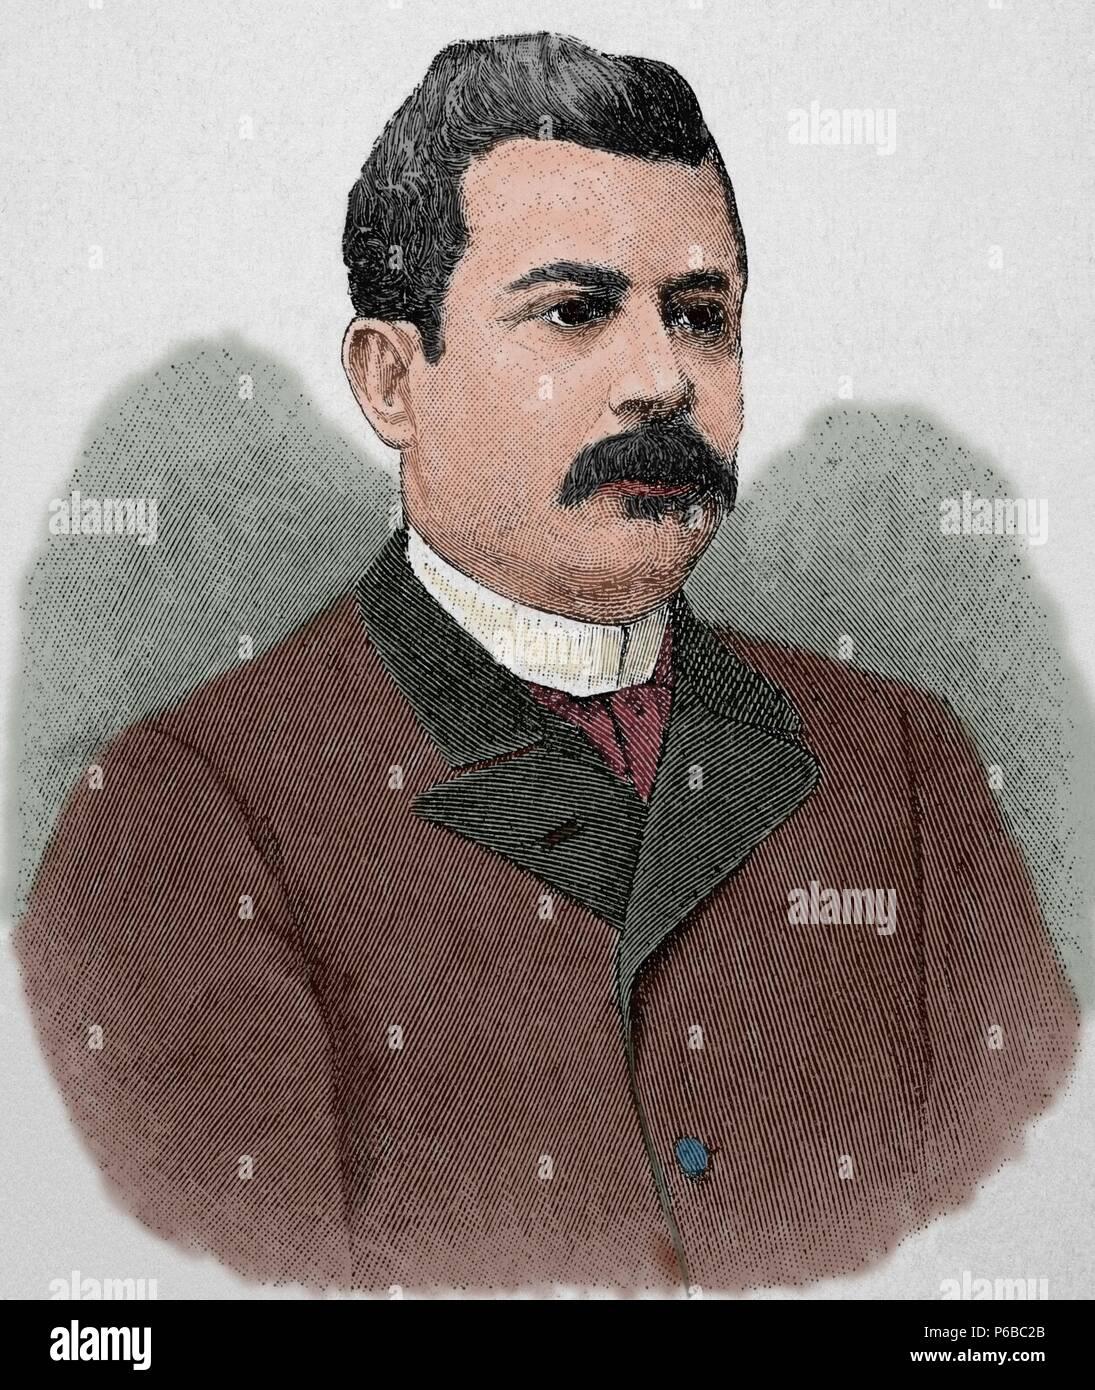 Juan Isidro Jimenes Pereyra (1846-1919) Dominican political. President of the Dominican Republic between 1899-1902 and 1914-1916. Engraving. 'La Ilustracion Artistica',1899. Colored. - Stock Image